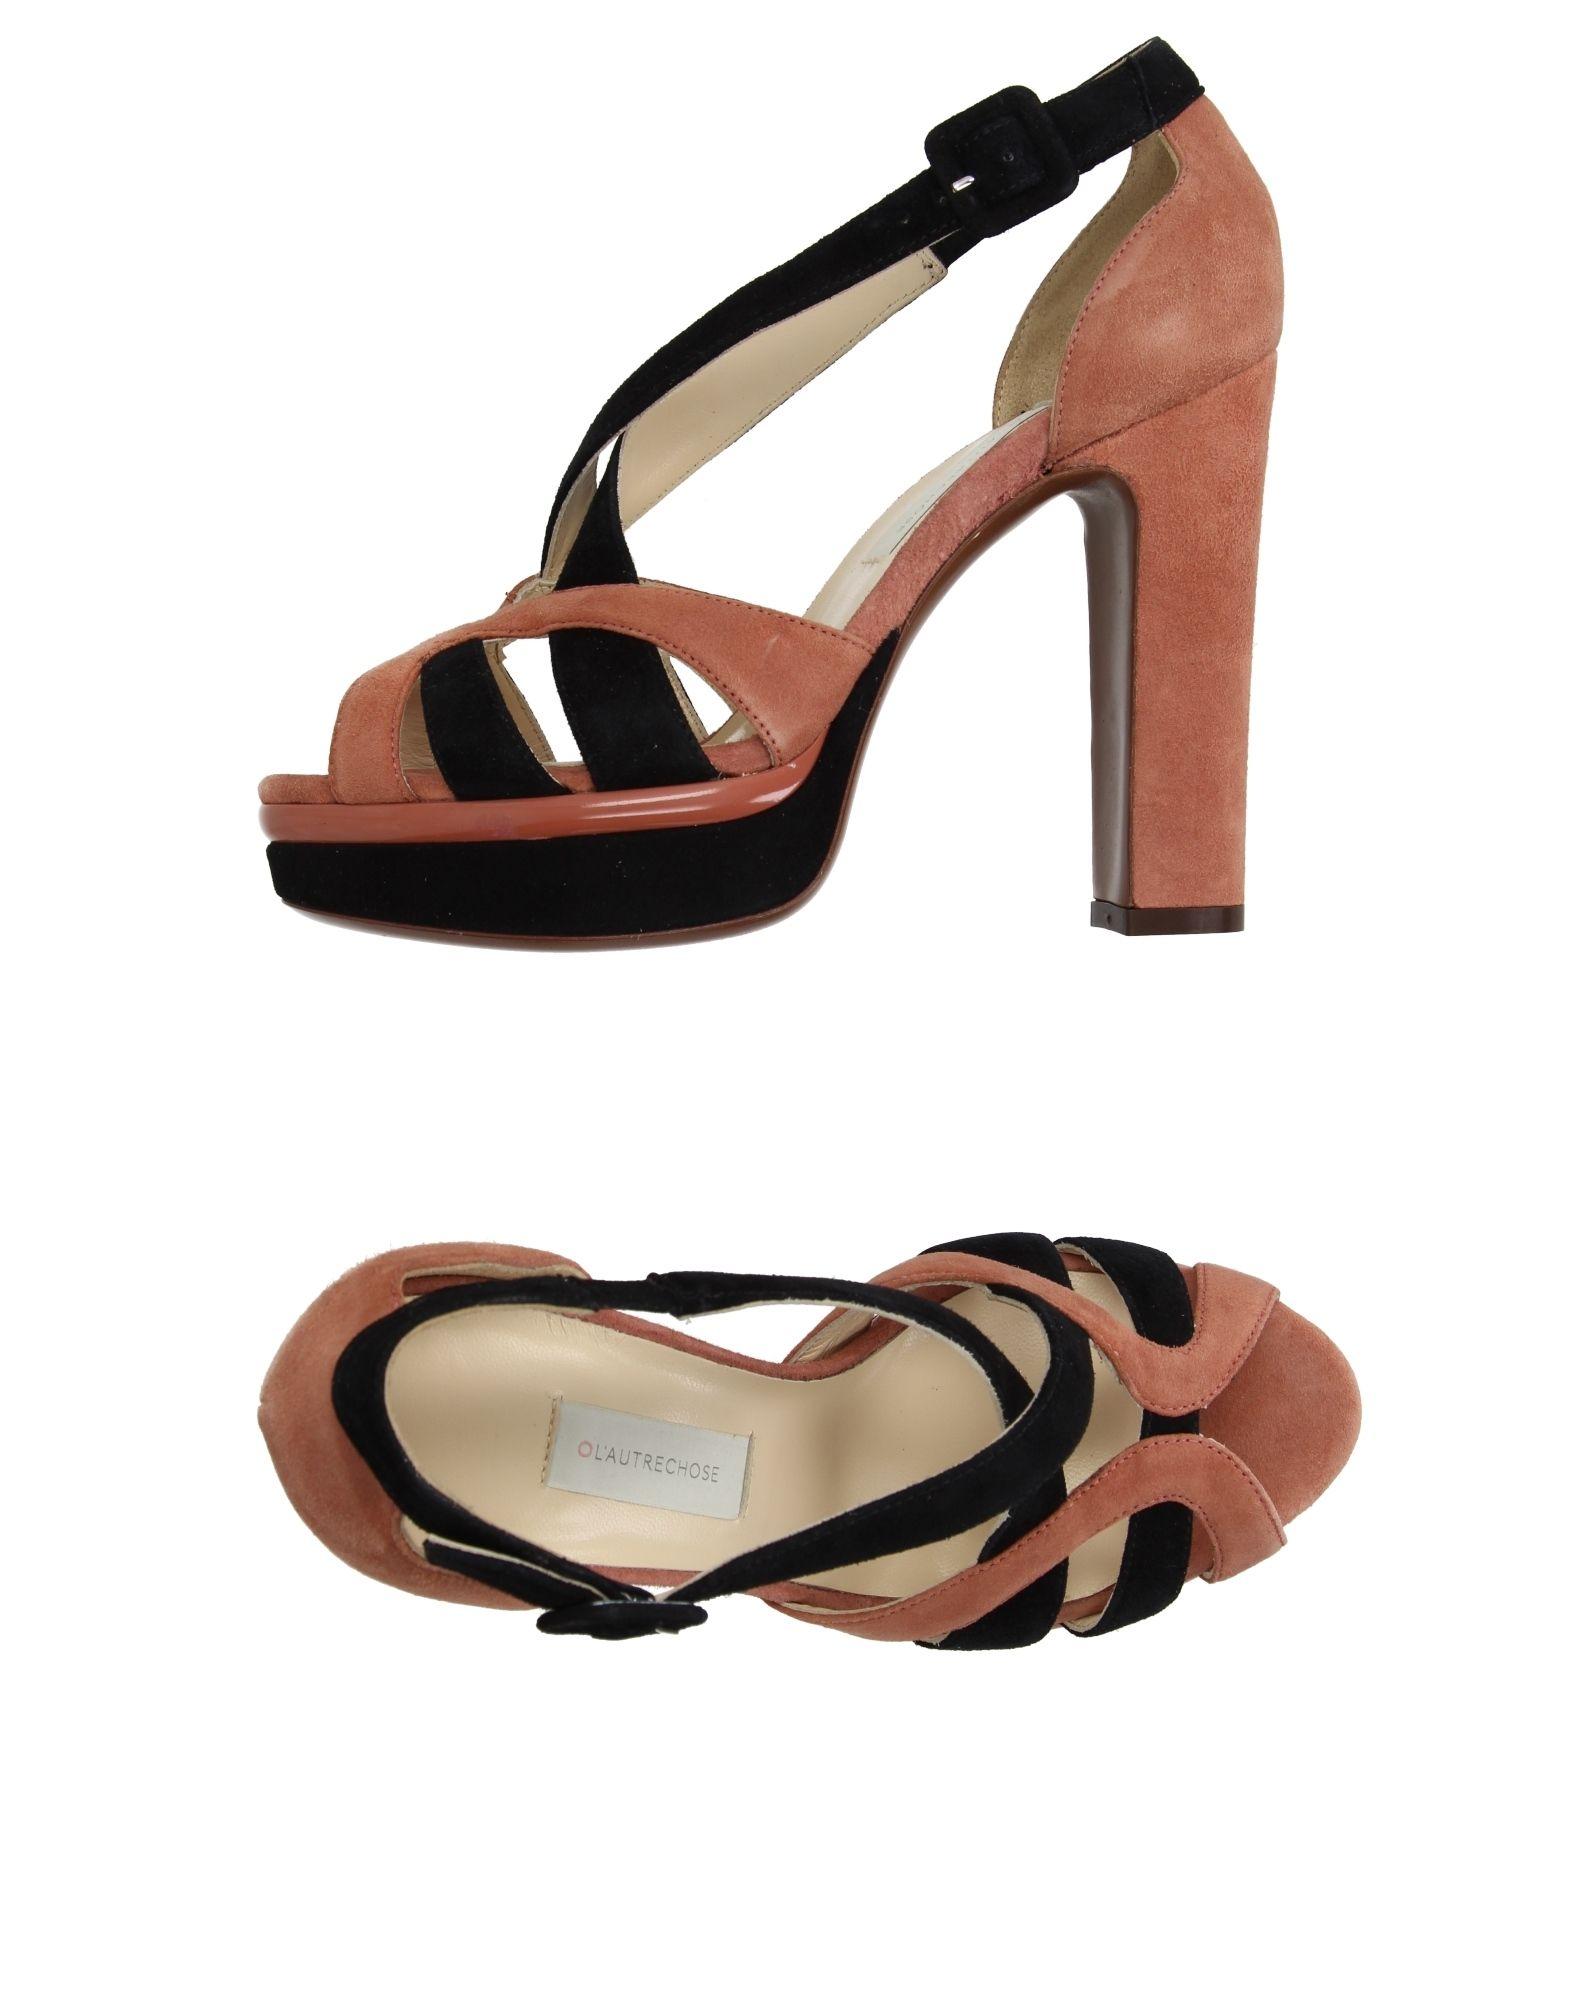 L' Damen Autre Chose Sandalen Damen L'  11188749HK Gute Qualität beliebte Schuhe 250556